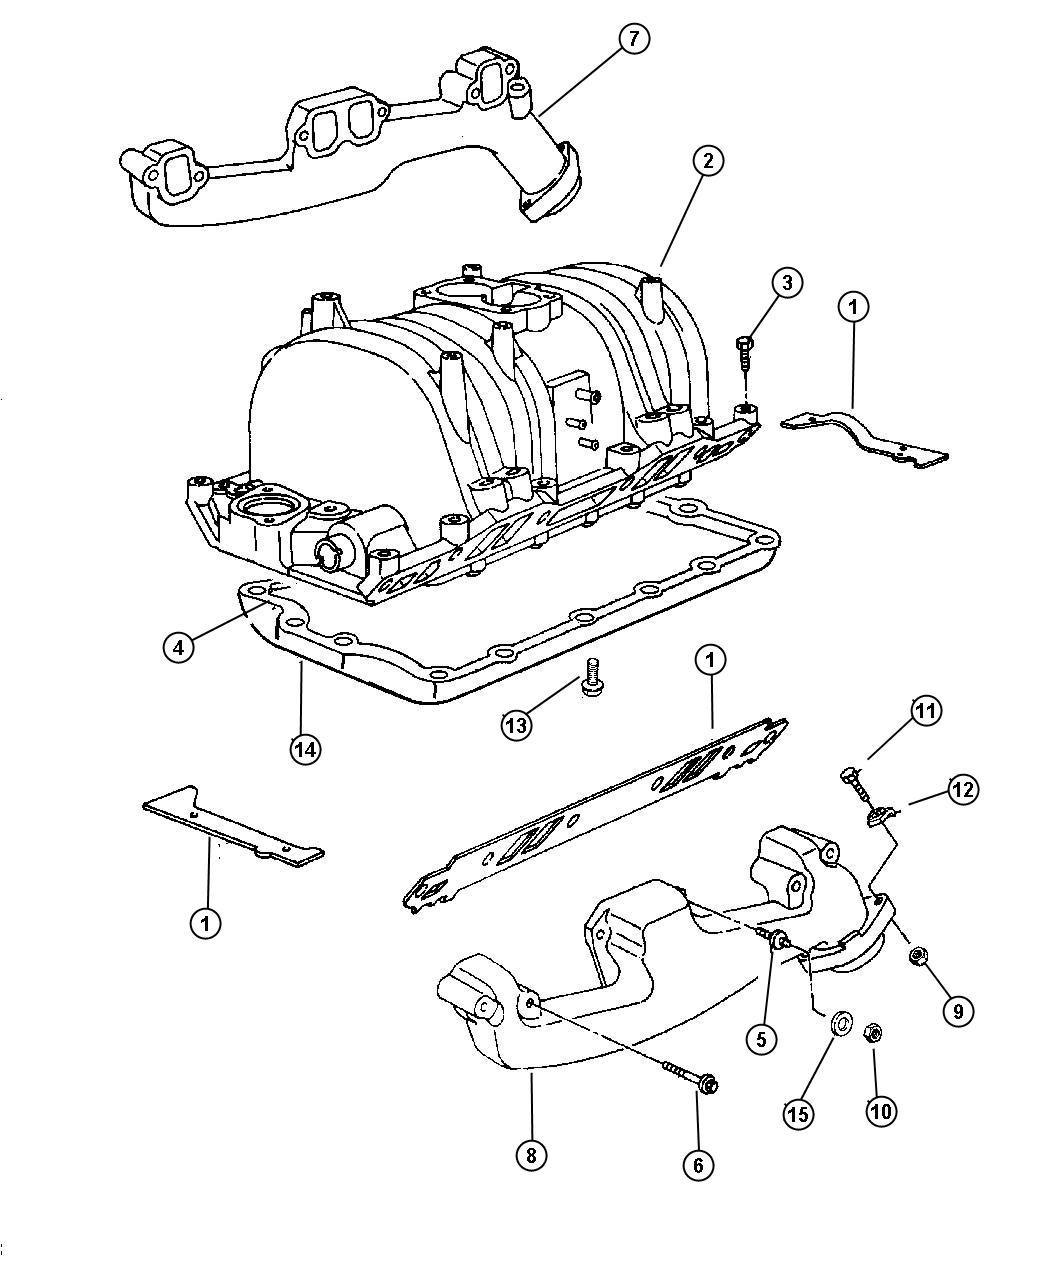 Dodge Ram 2500 Gasket package. Intake manifold. Exhaust